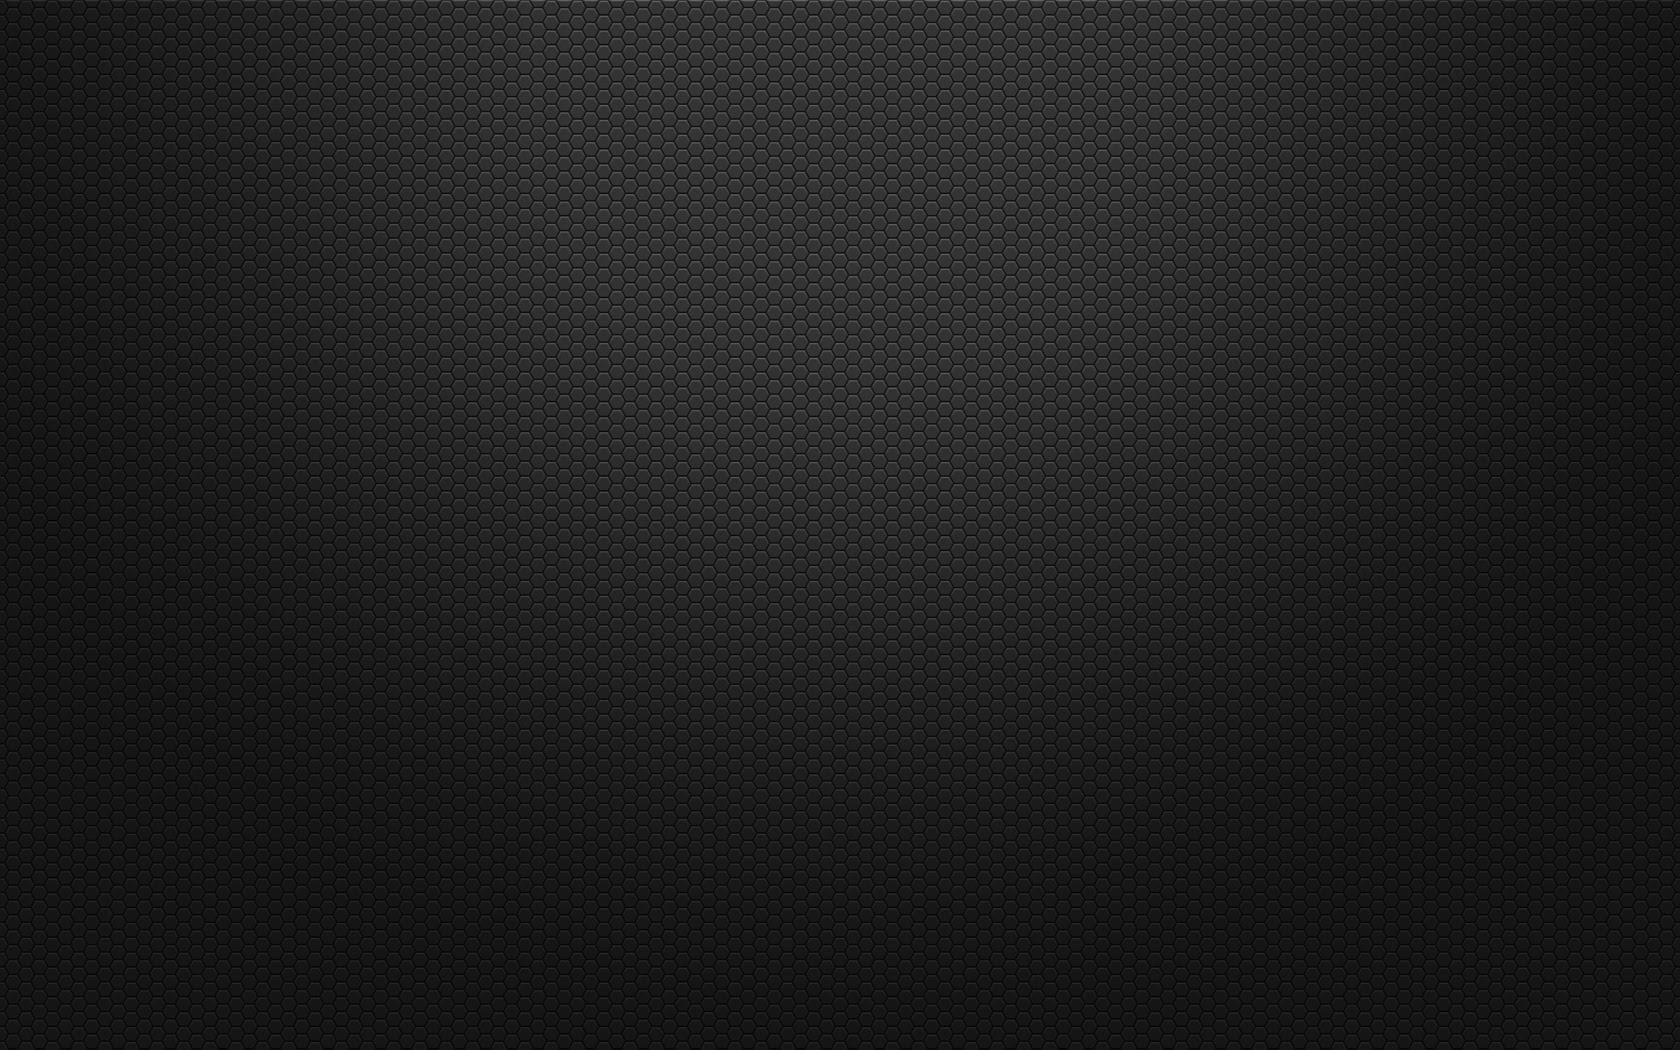 All Black Wallpaper Hd 15 Free Wallpaper  Hdblackwallpaper.com